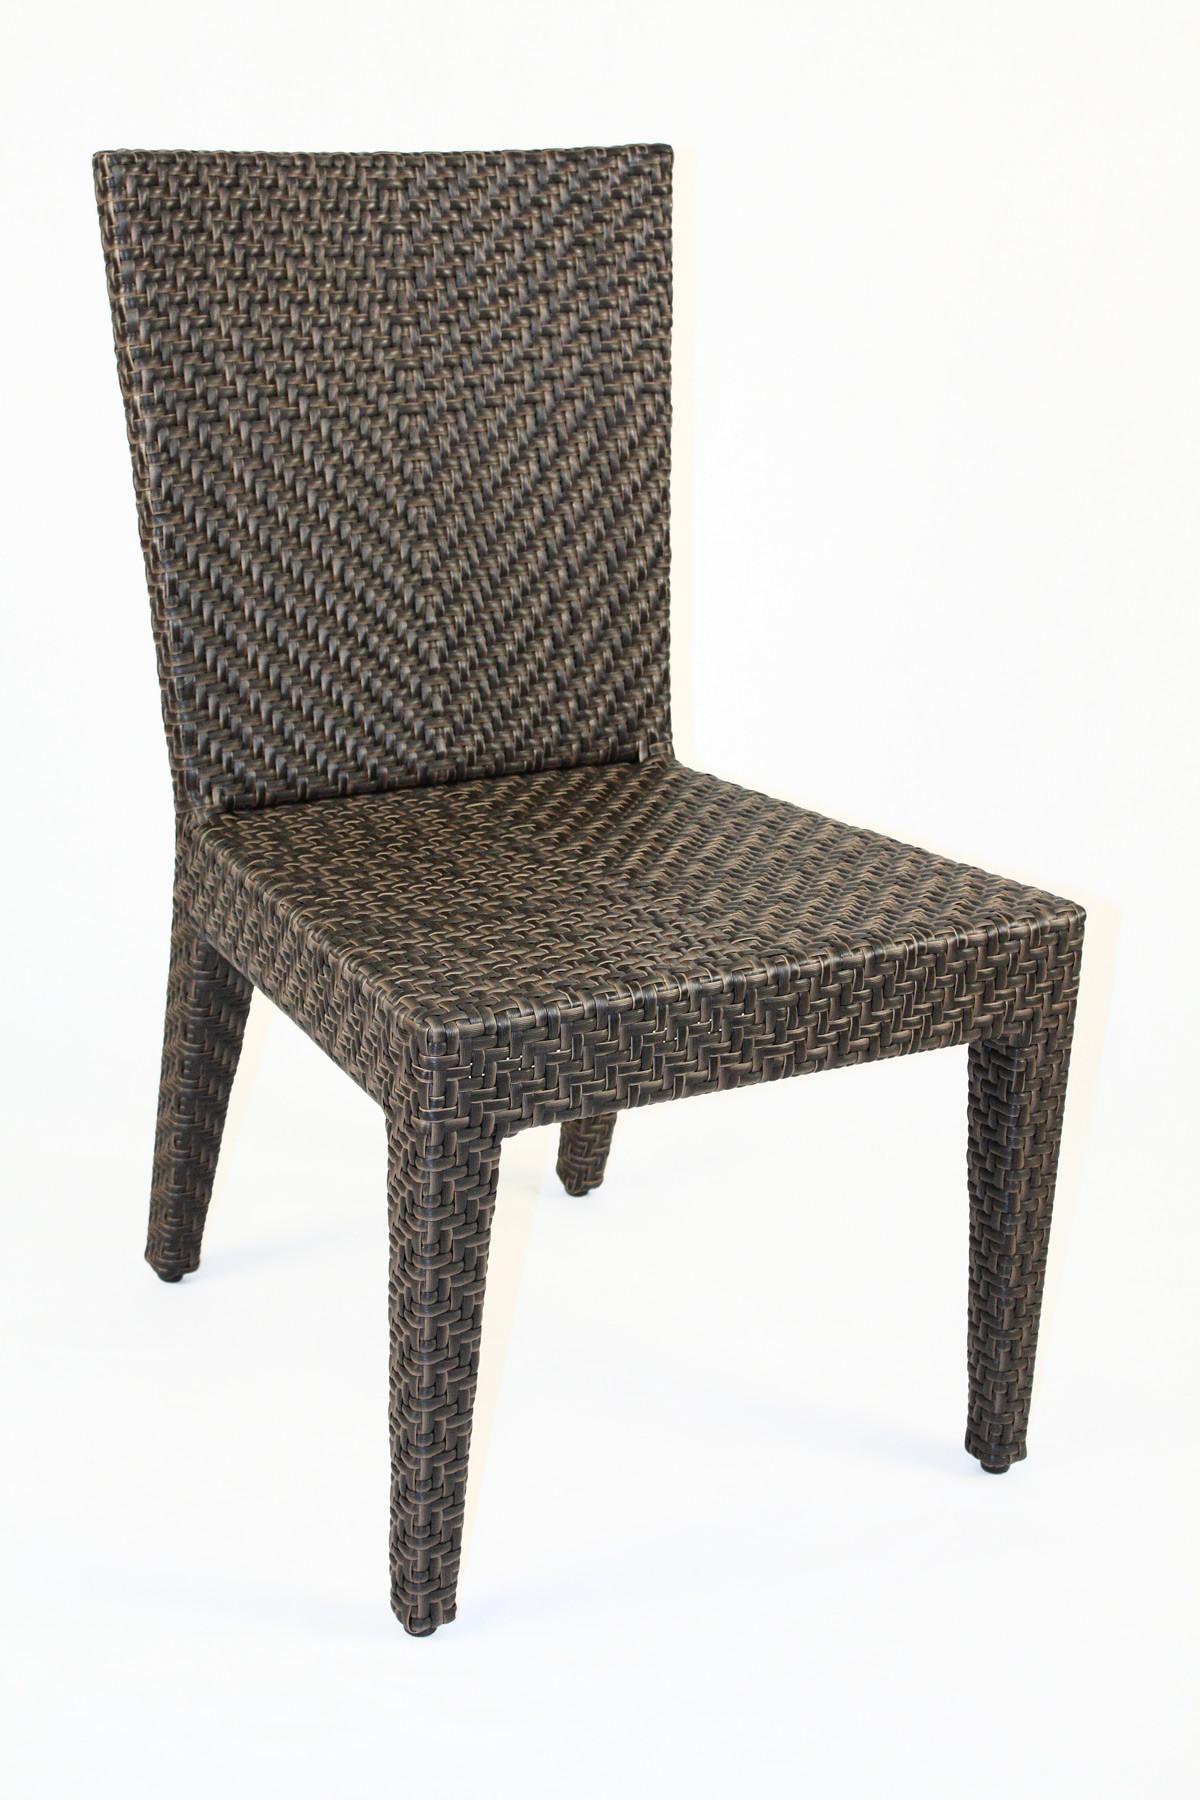 Hospitality rattan soho 3 piece wicker side chair bistro set - Cane bistro chairs ...